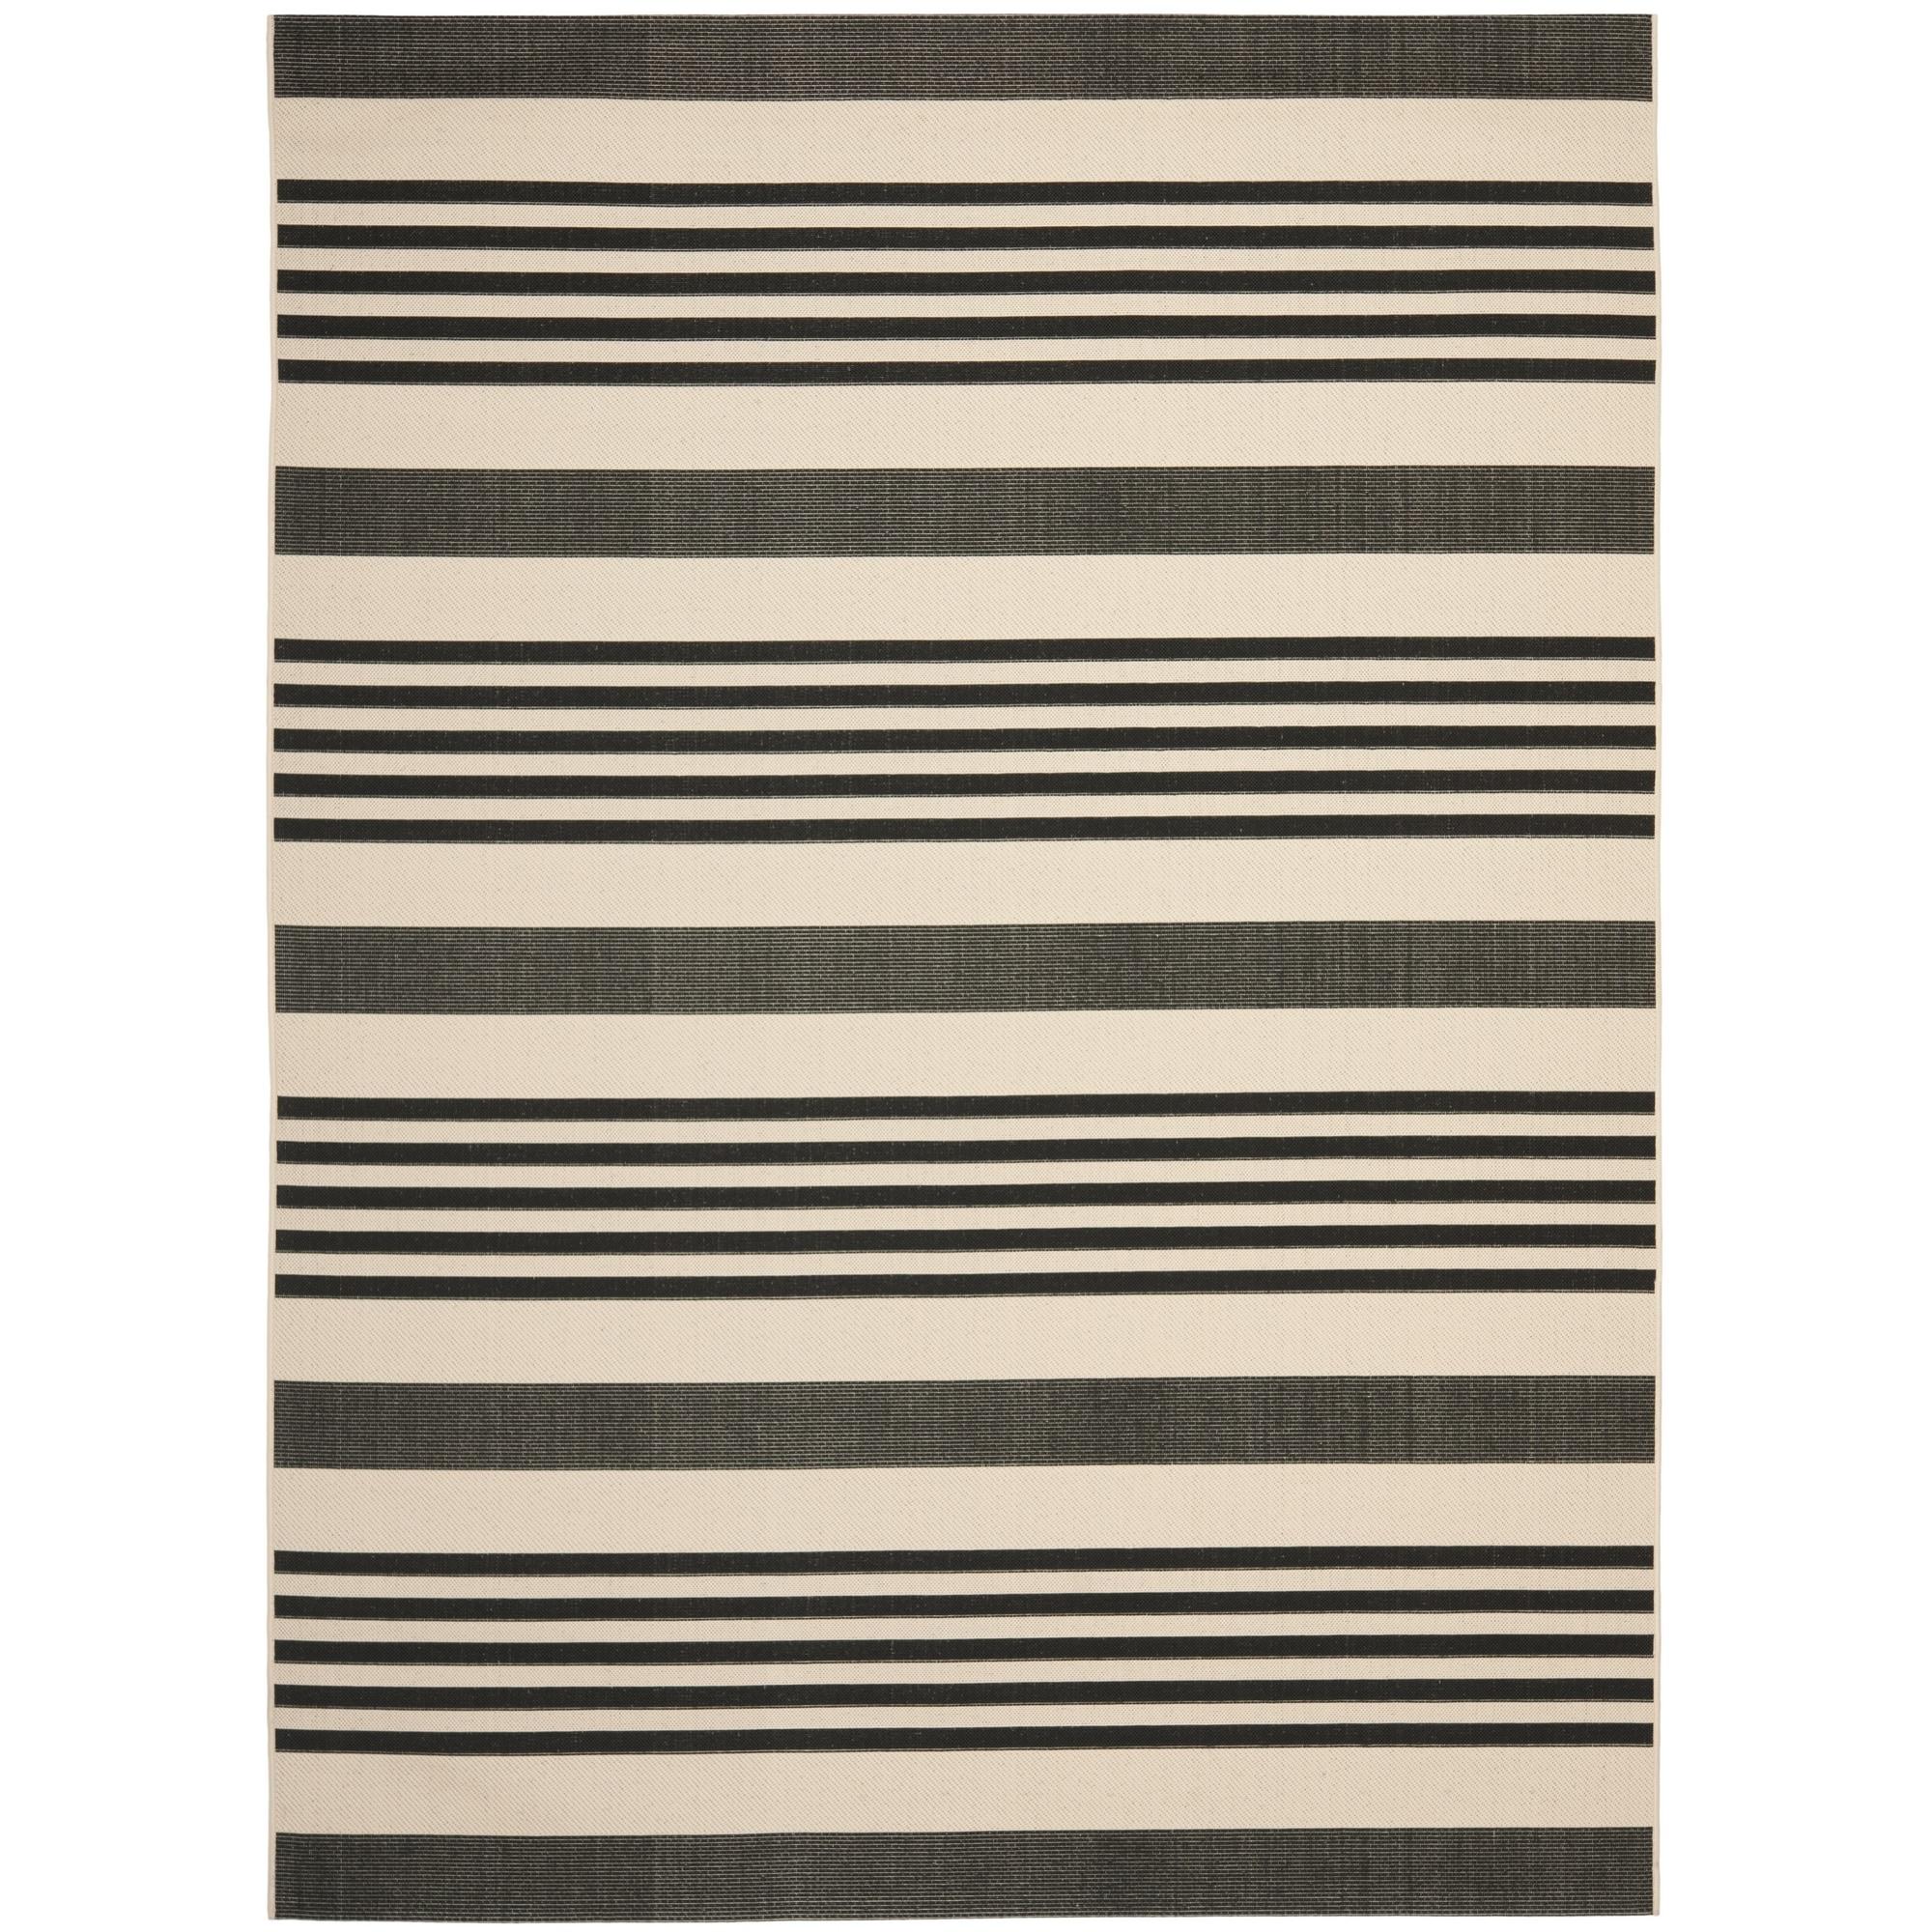 Safavieh Indoor/ Outdoor Courtyard Black/ Bone Rug (9' x 12') at Sears.com